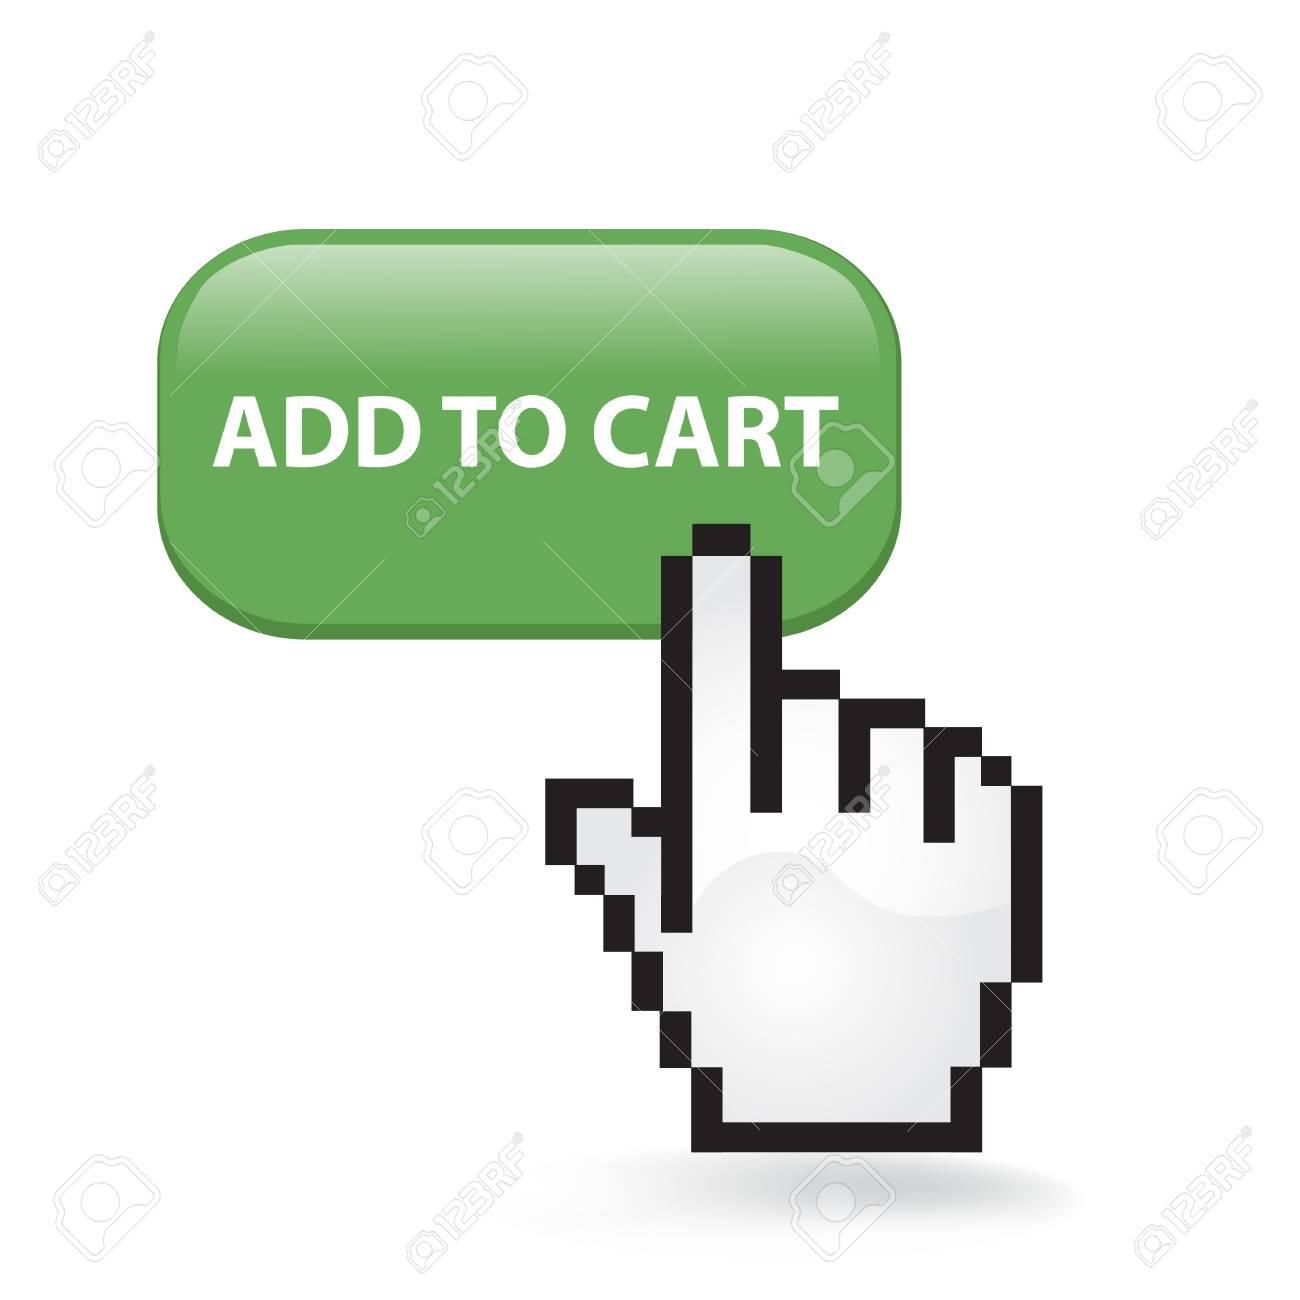 Add To Cart Button Cursor Hand Stock Vector - 99117787